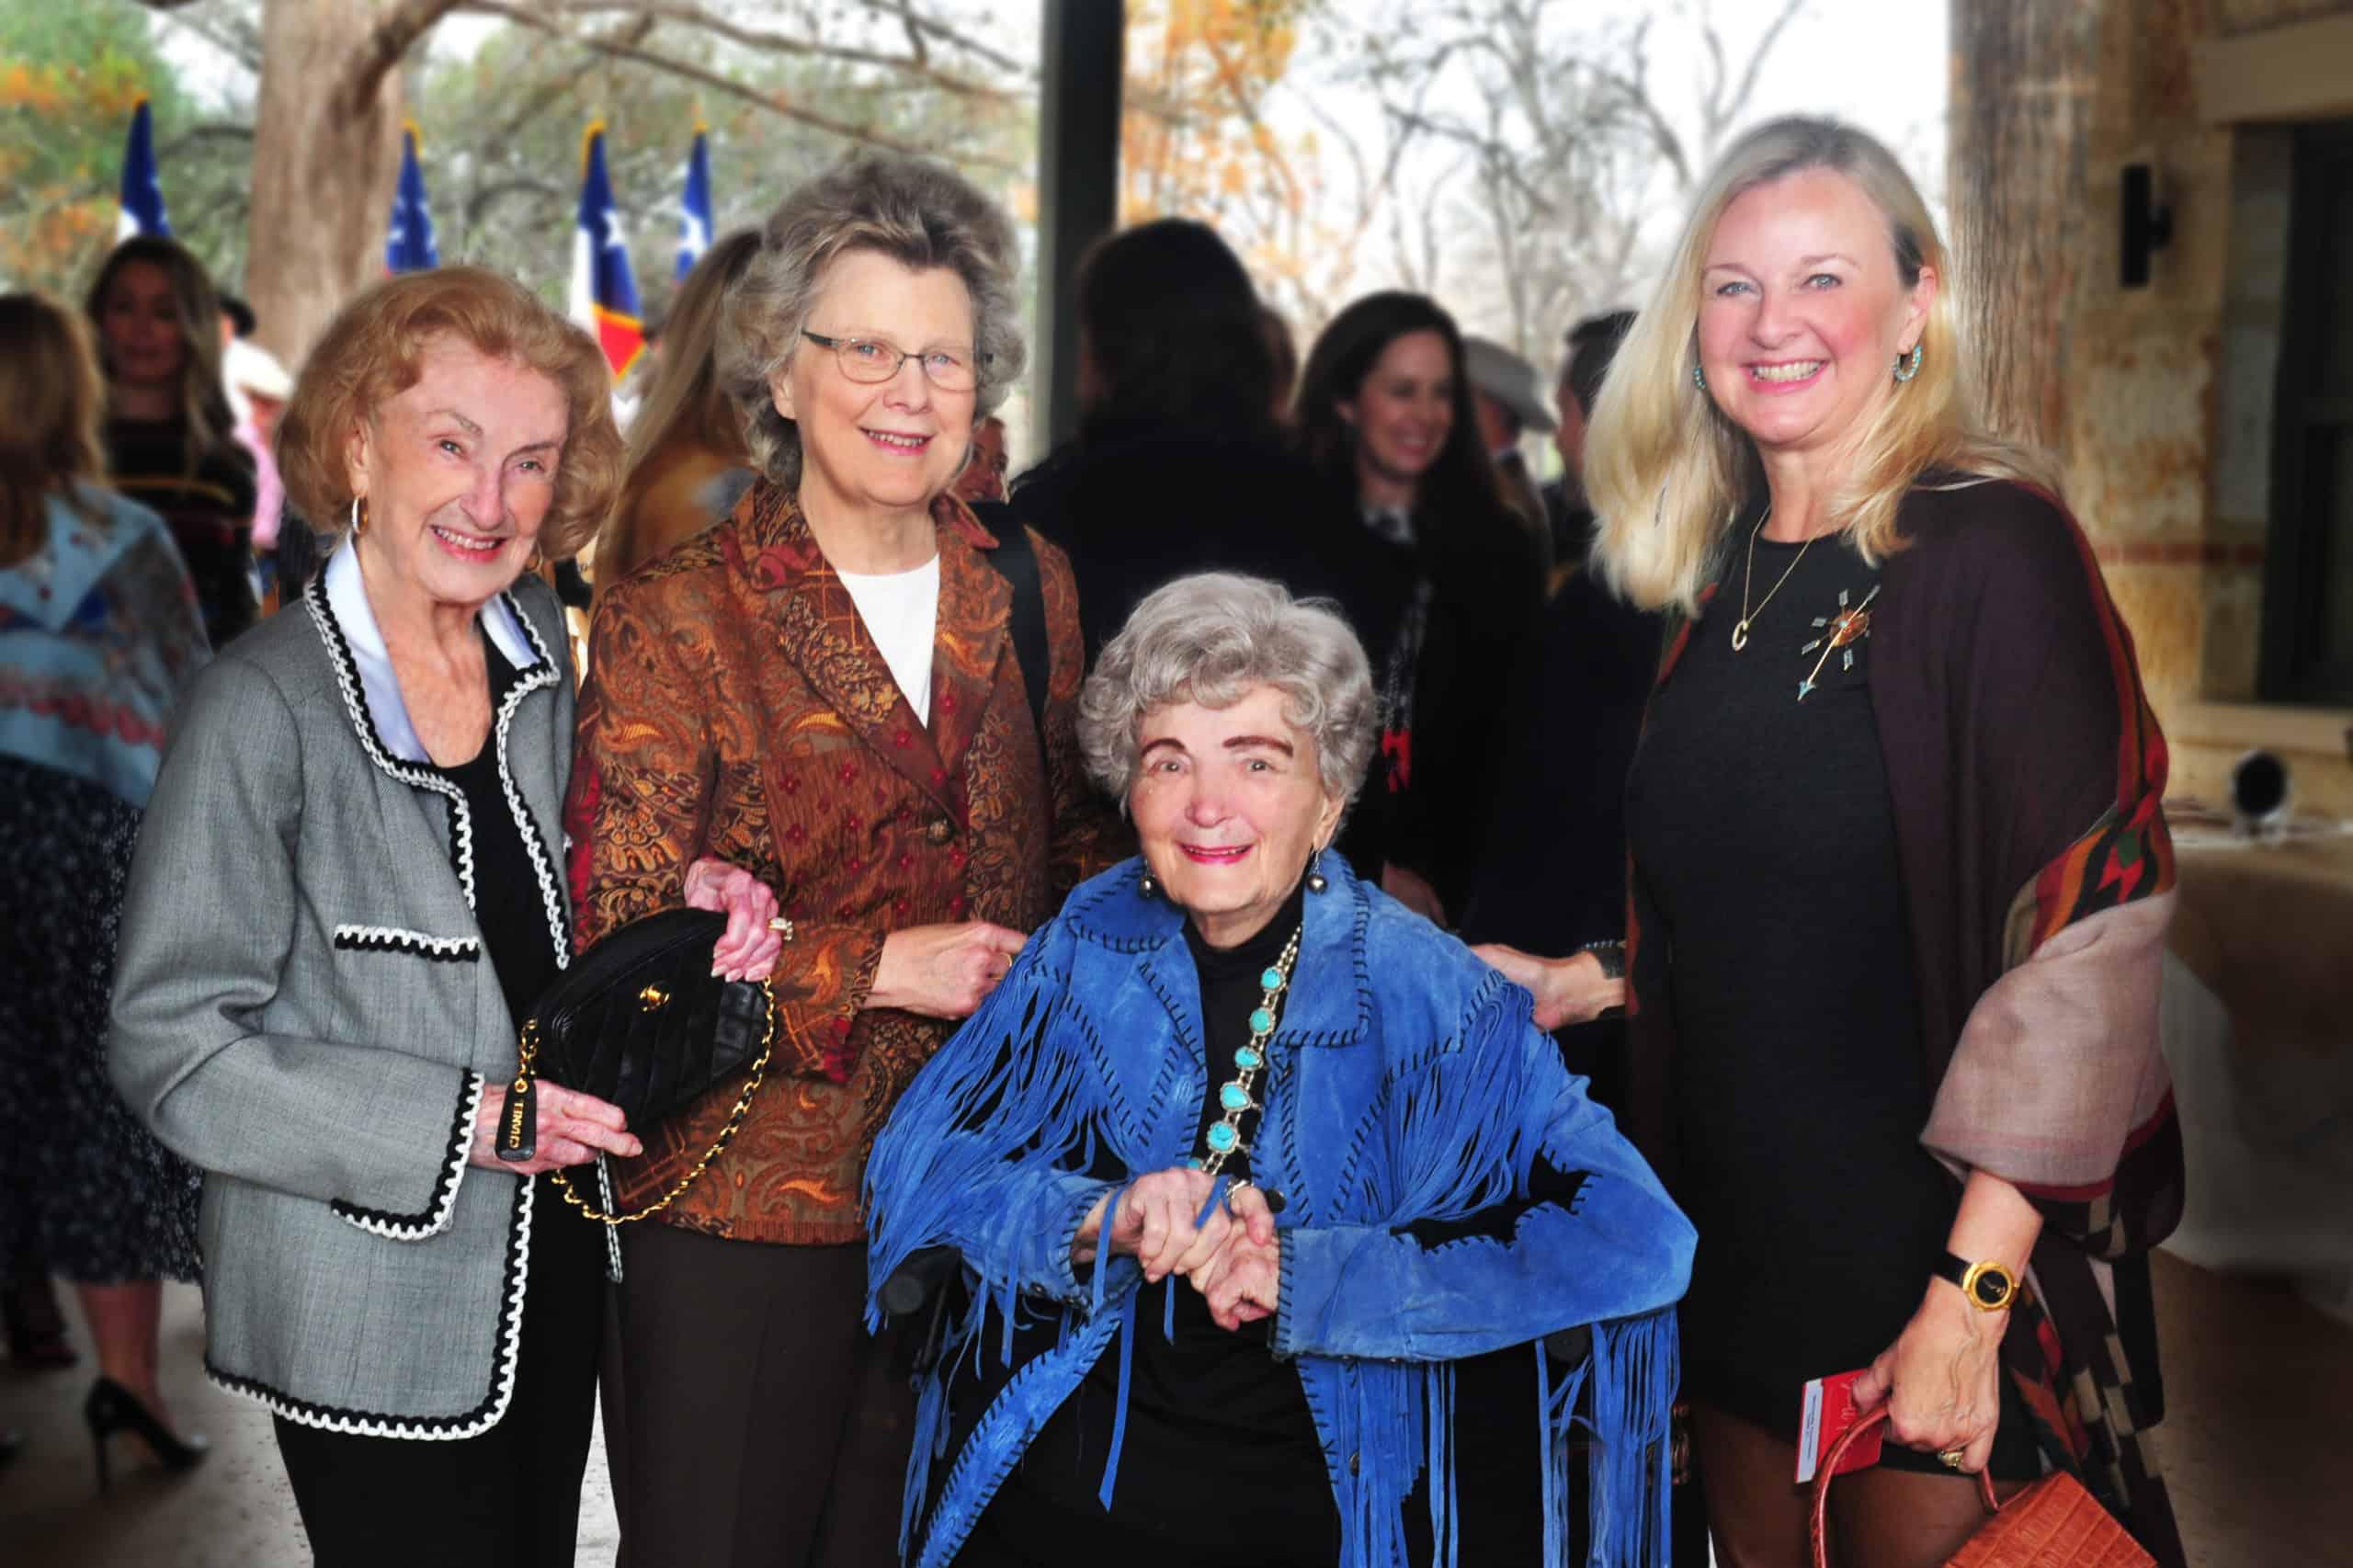 Charline McCombs, Marsha Shields, Lila Cockrell and Connie McNab